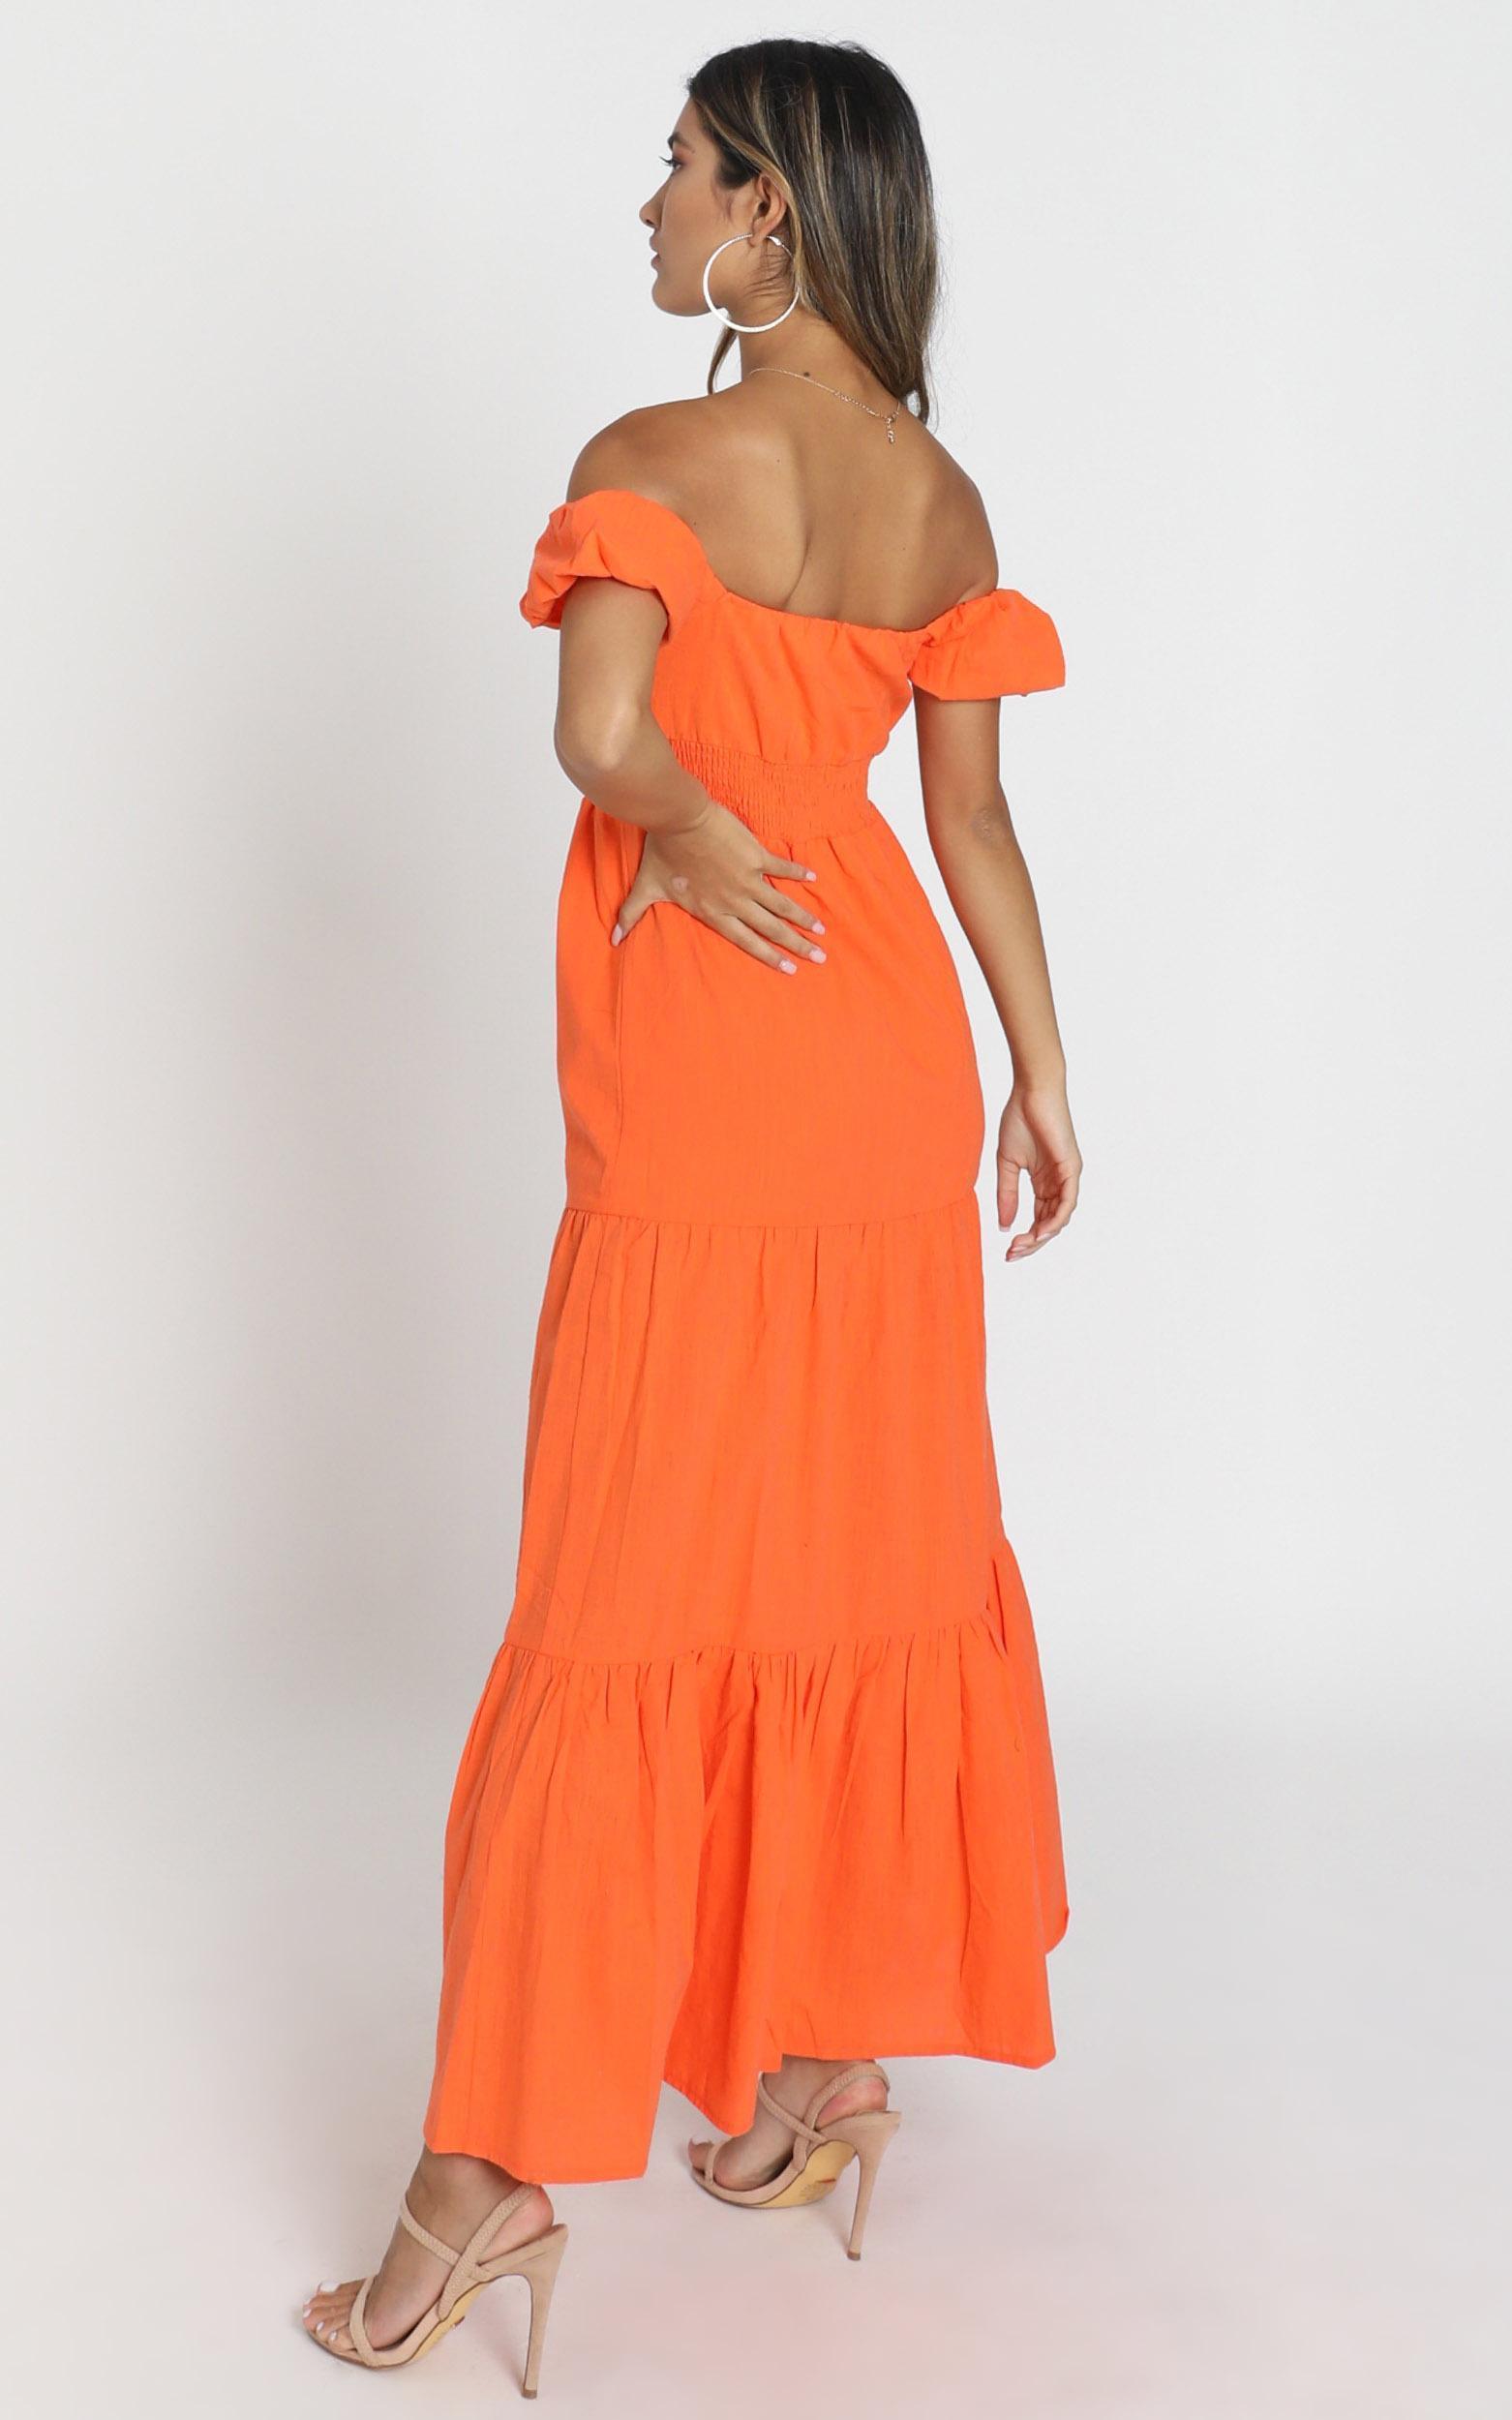 Island Hopper Dress in orange - 6 (XS), Orange, hi-res image number null